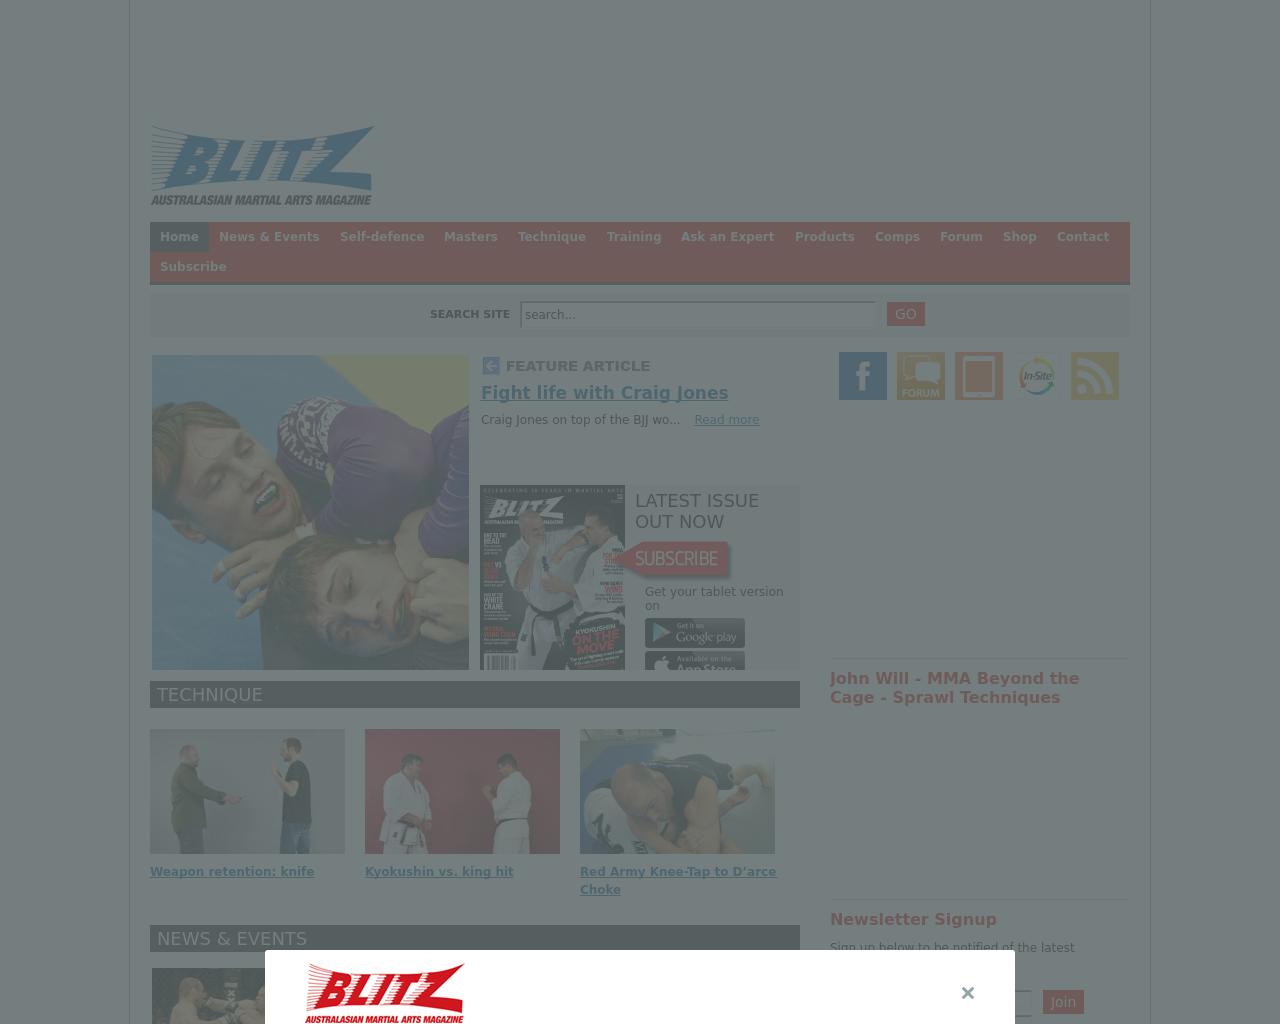 BLITZ-Advertising-Reviews-Pricing